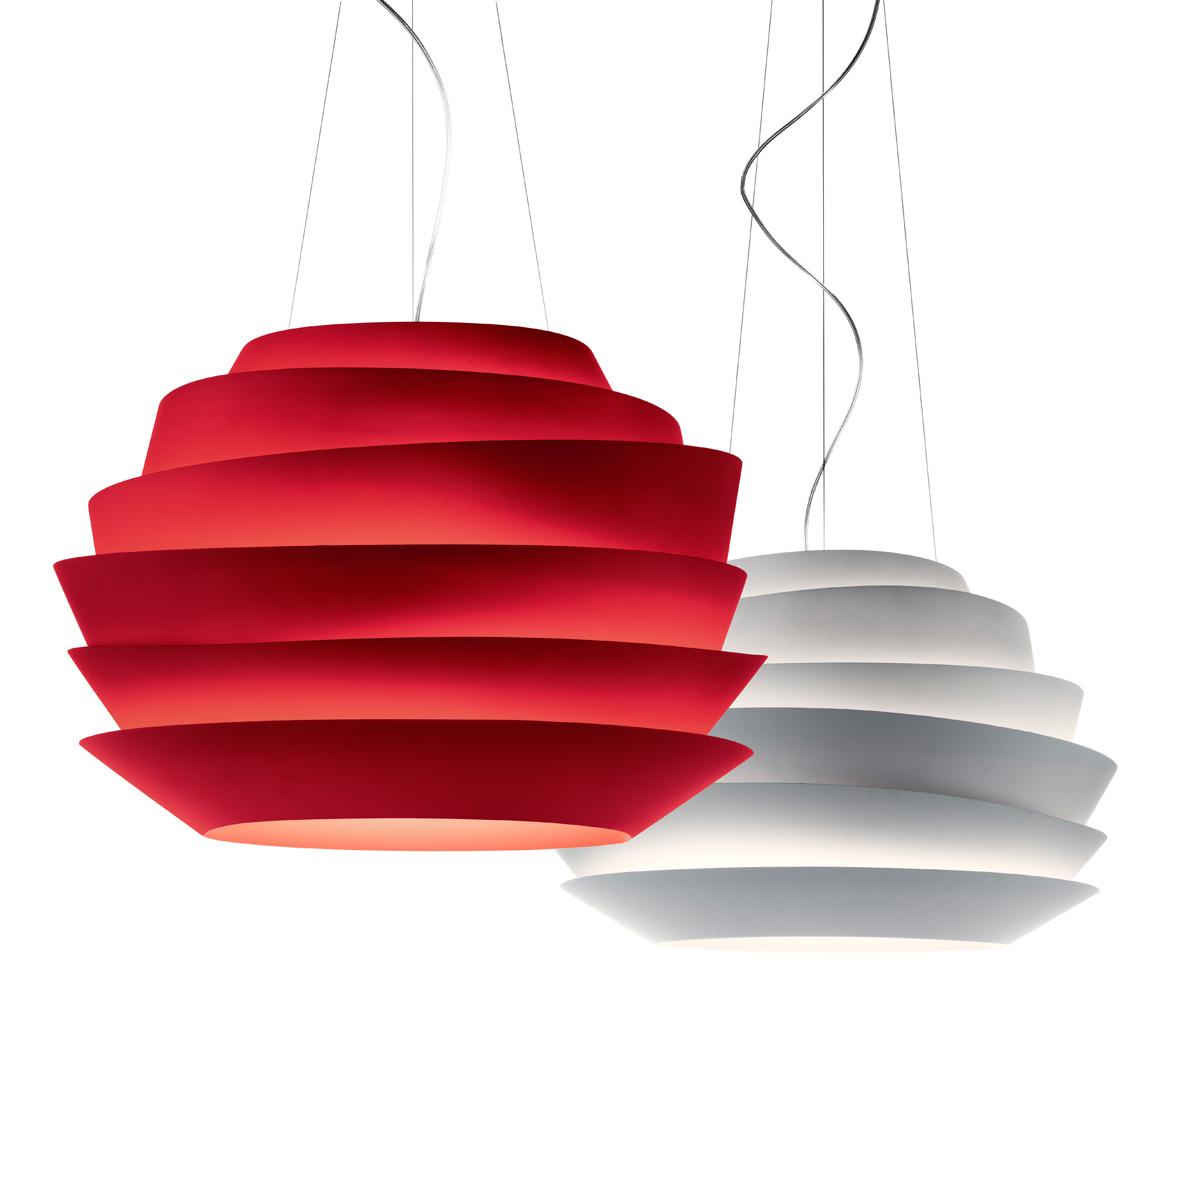 pendelleuchte le soleil sospensione online shop f r foscarini pendelleuchten rump. Black Bedroom Furniture Sets. Home Design Ideas